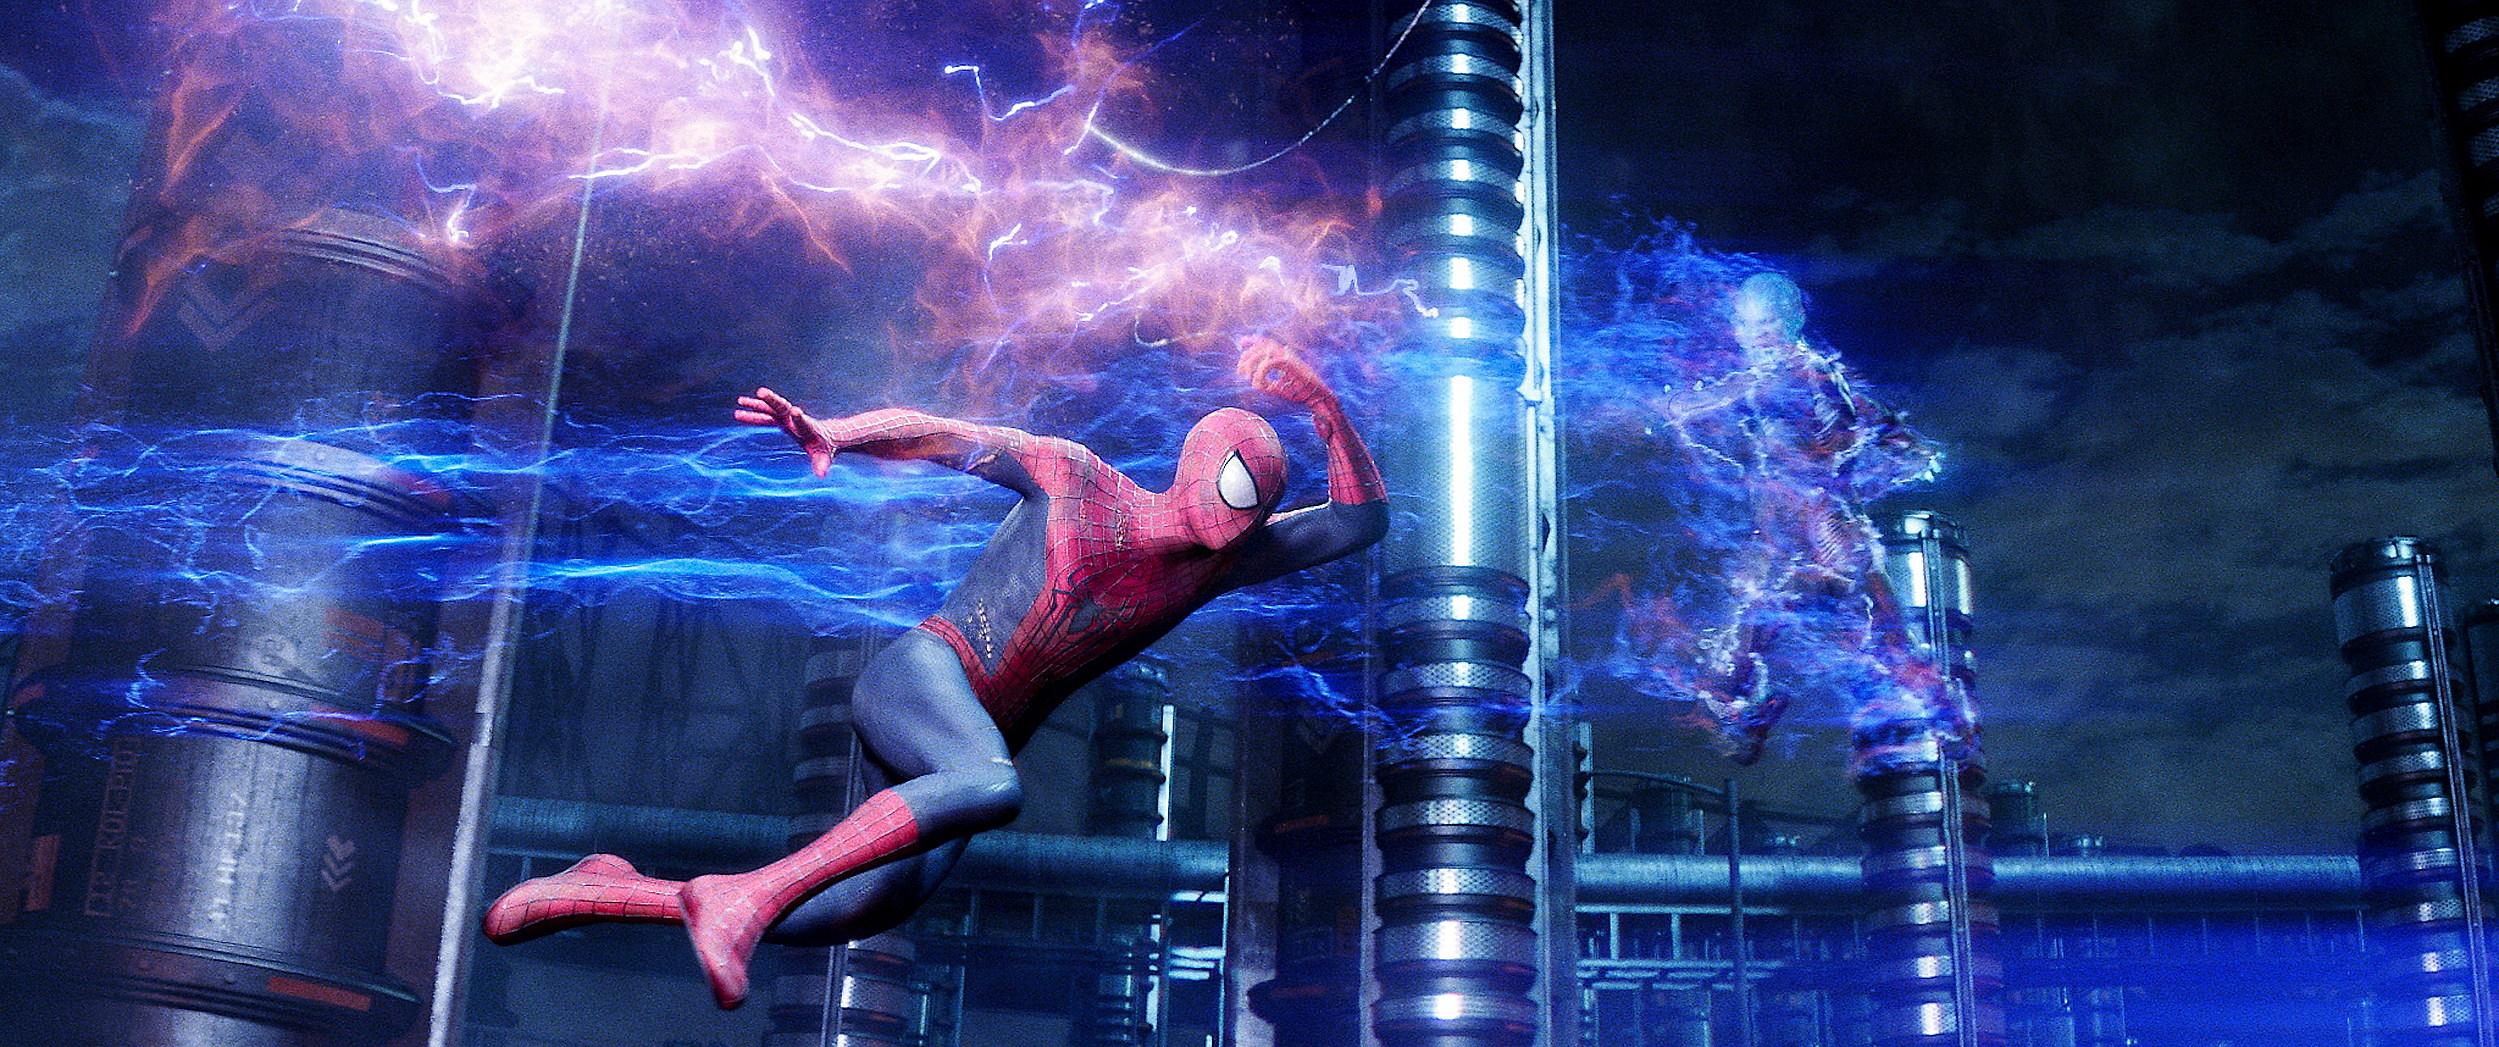 New 'Amazing Spider-Man 2' Photos Put the Spotlight on Electro  Spider